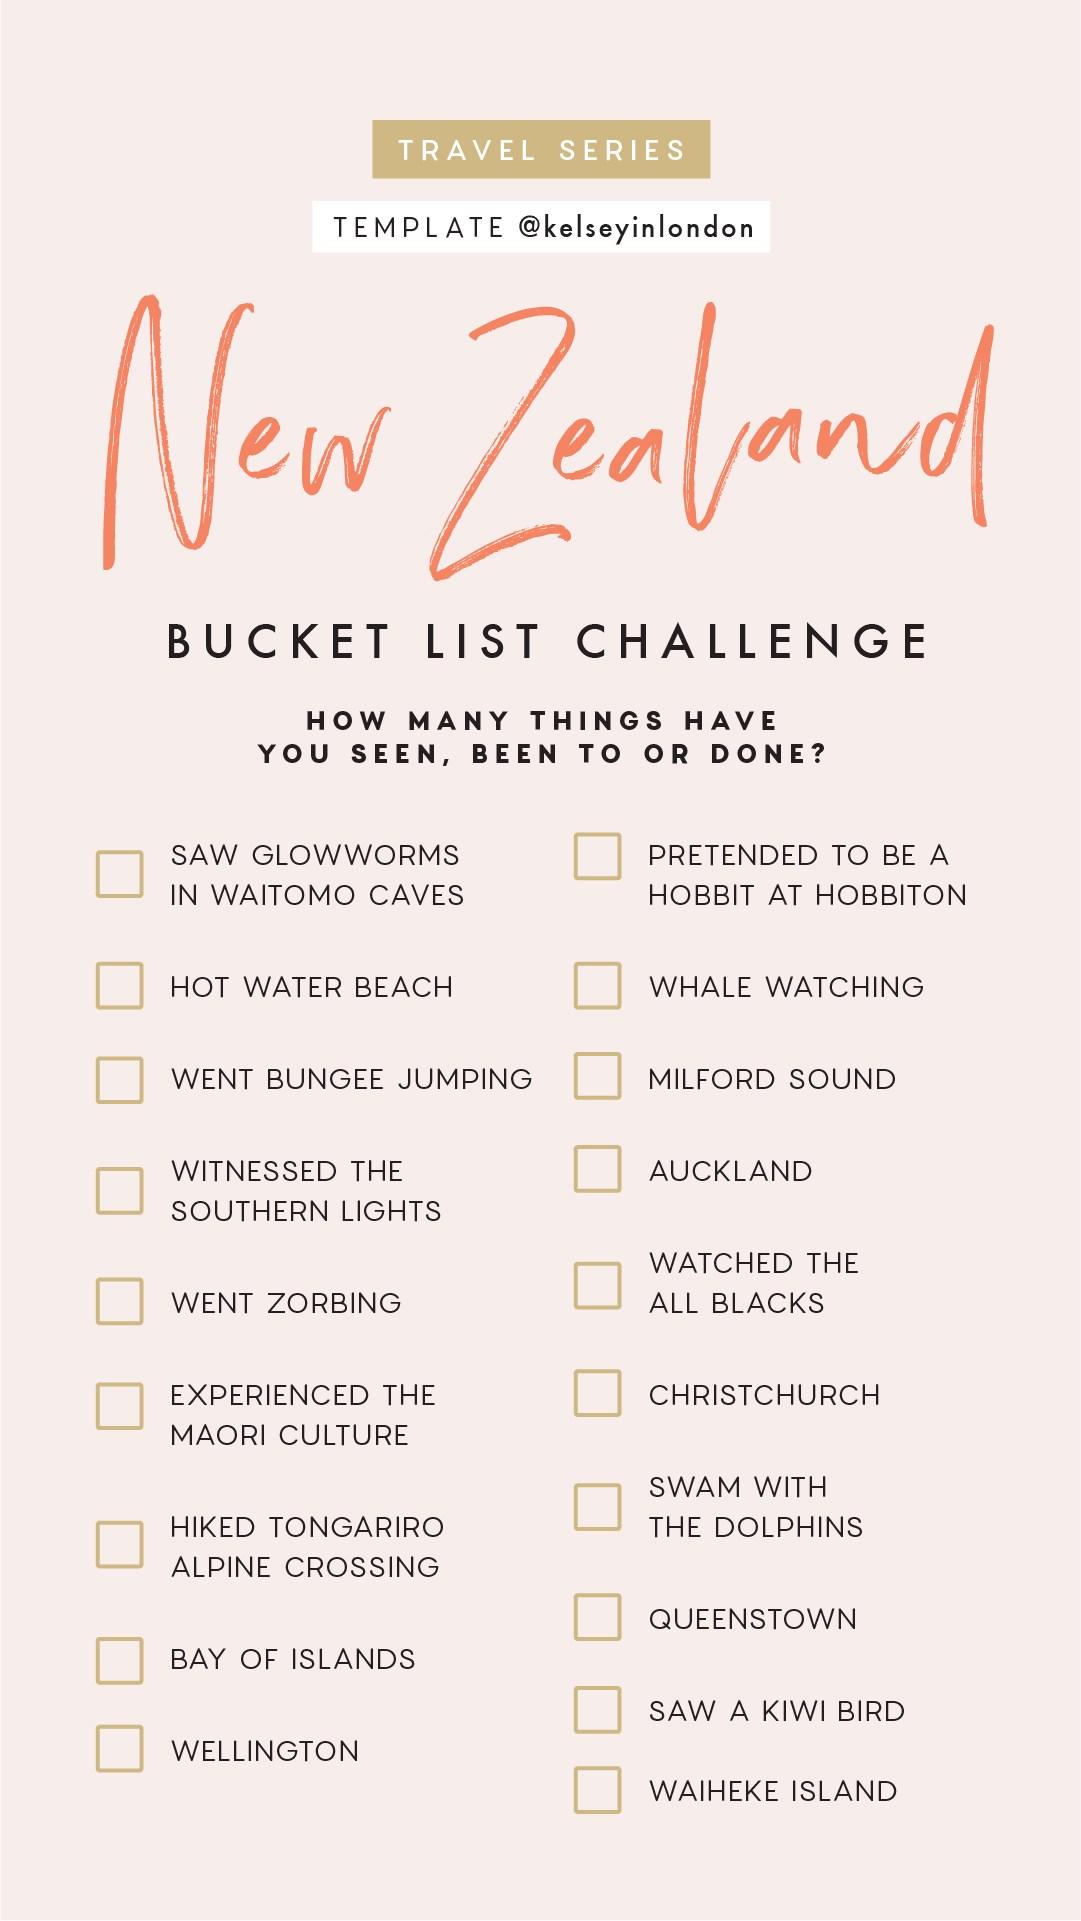 Top things to do in New Zealand Bucket list Instagram Story Template kelseyinlondon Kelsey Heinrichs What to do in New Zealand Where to go in New Zealand top places in New Zealand